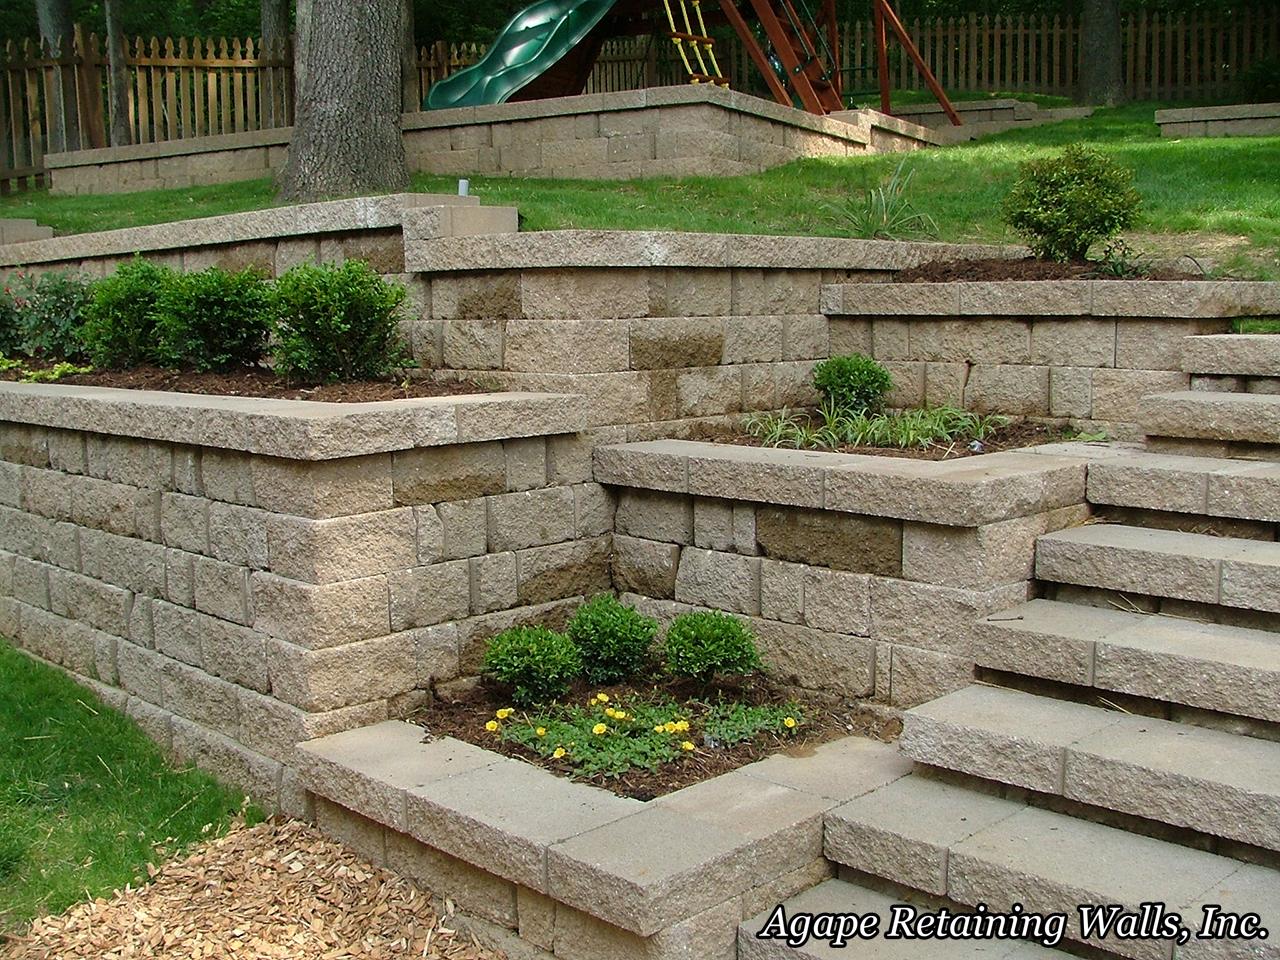 Agape retaining walls inc terrace photo album 3 for Landscaping garden walls